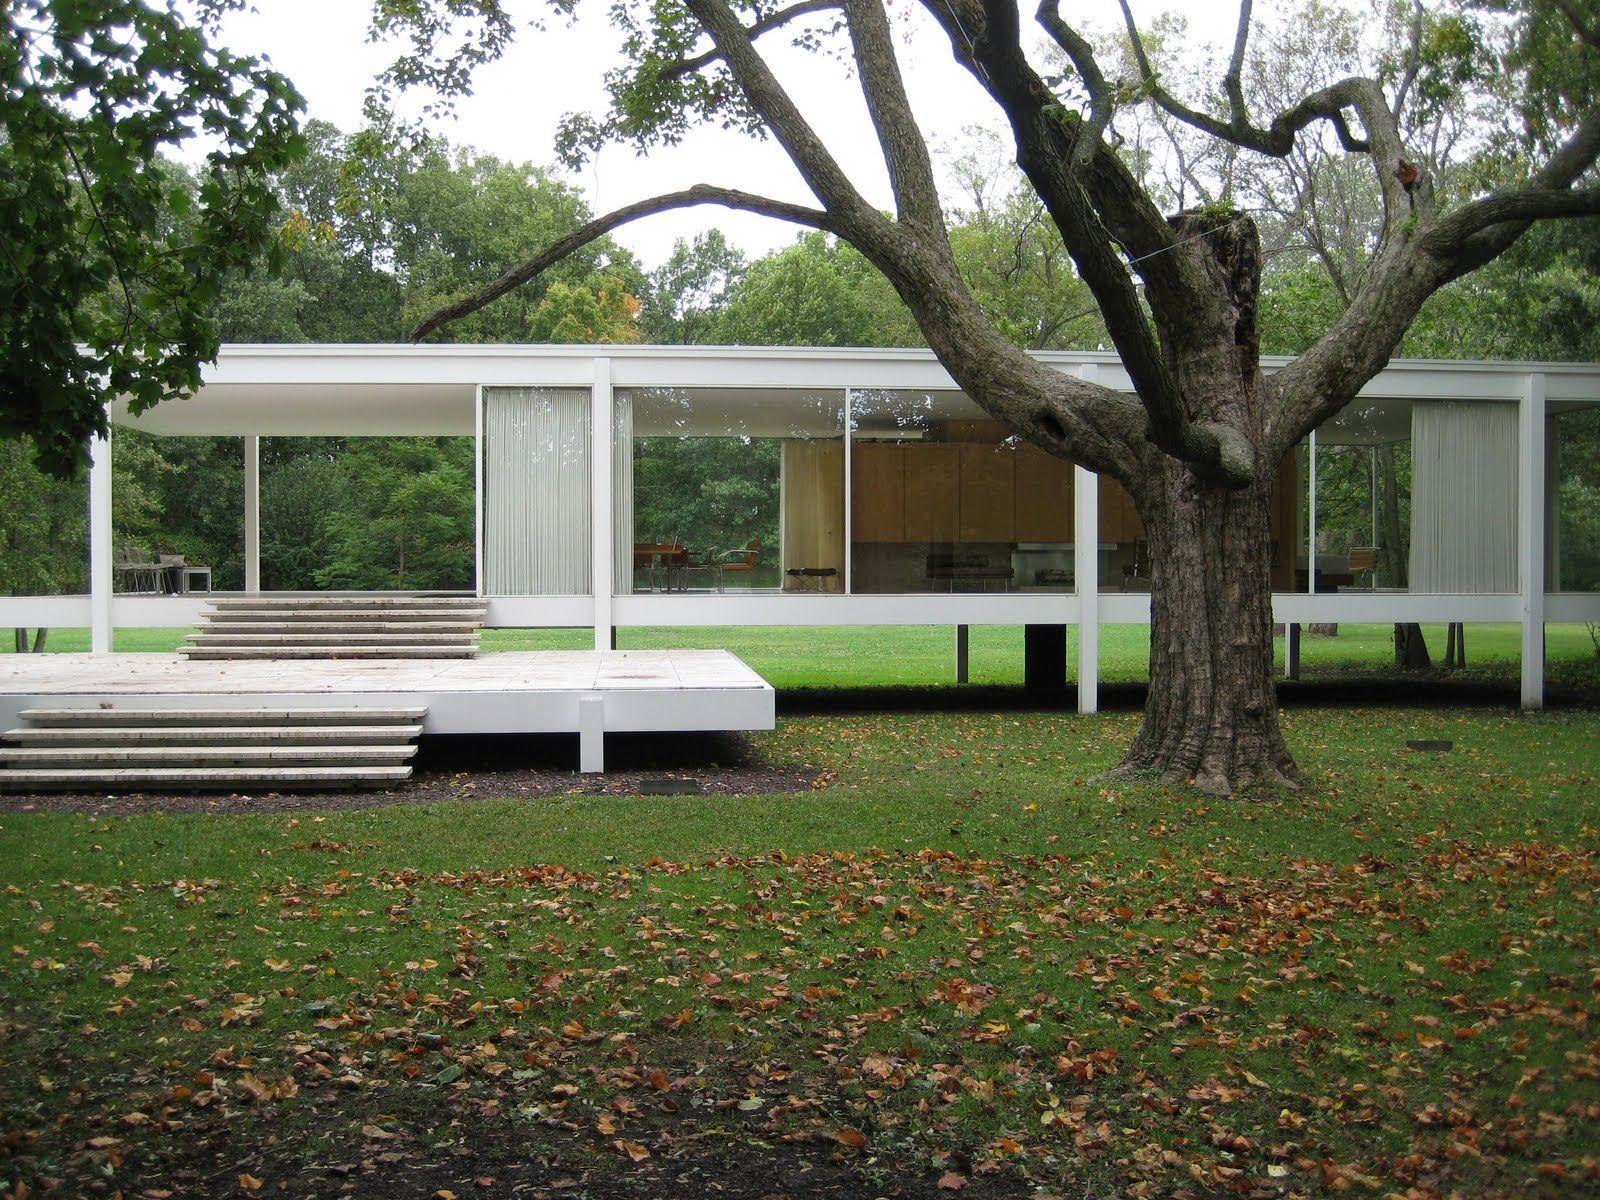 Farnsworth house by mies van der rohe exterior 8 jpg - Farnsworth House